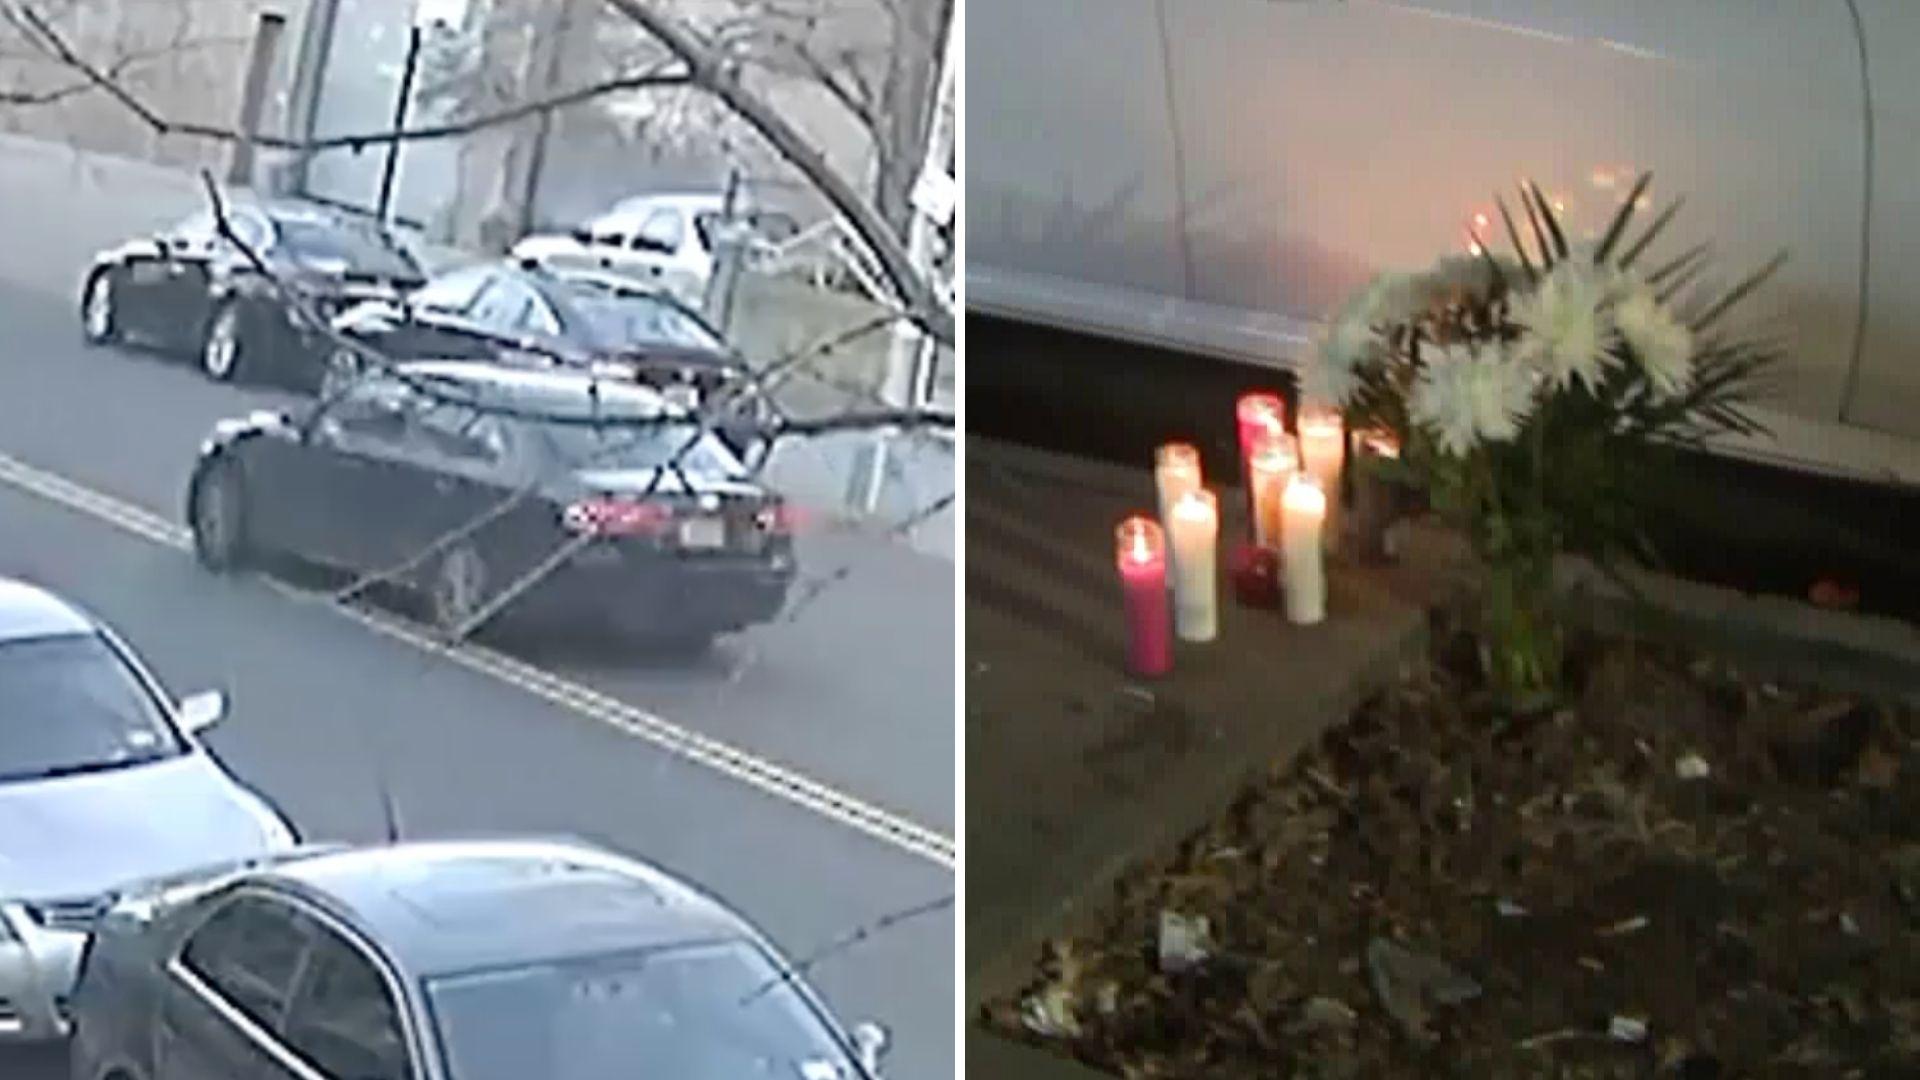 Black sedan connected to Brooklyn hit-and-run death